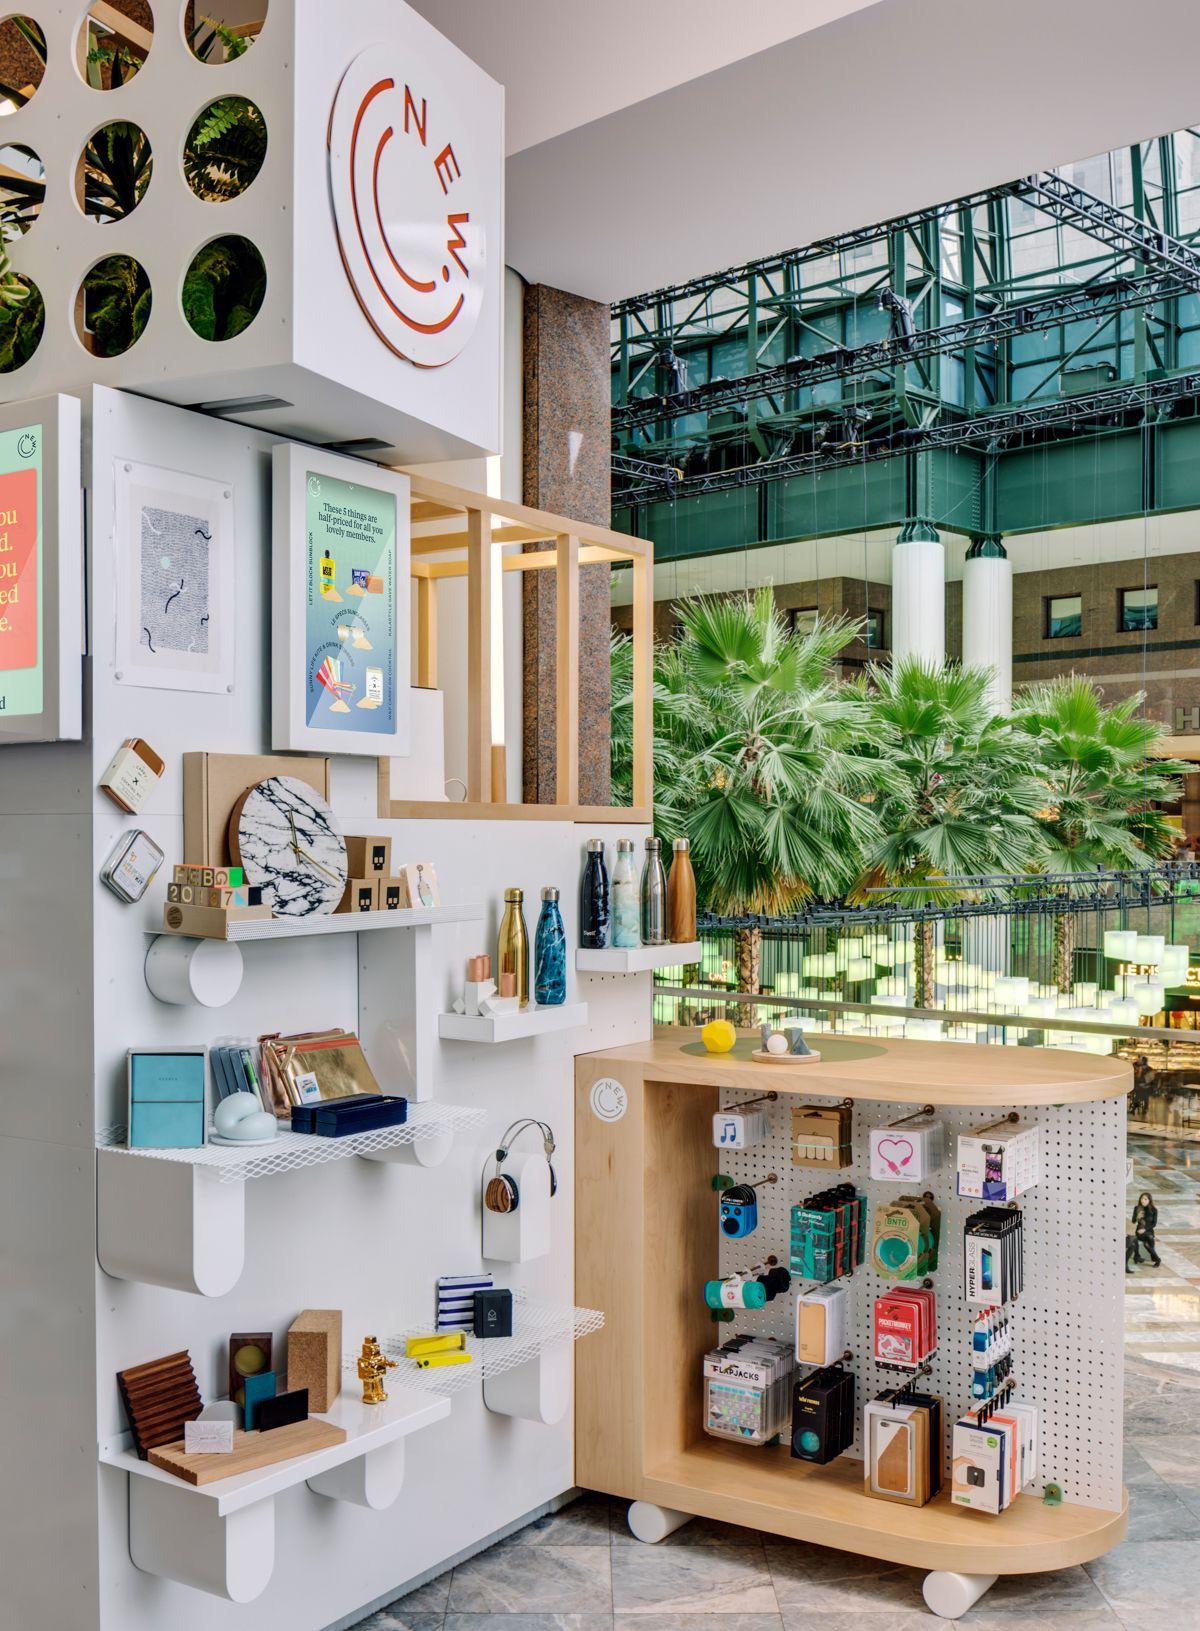 06 Um Tns Hr Design Milk Small Shop Design Retail Store Design Shop Interior Design